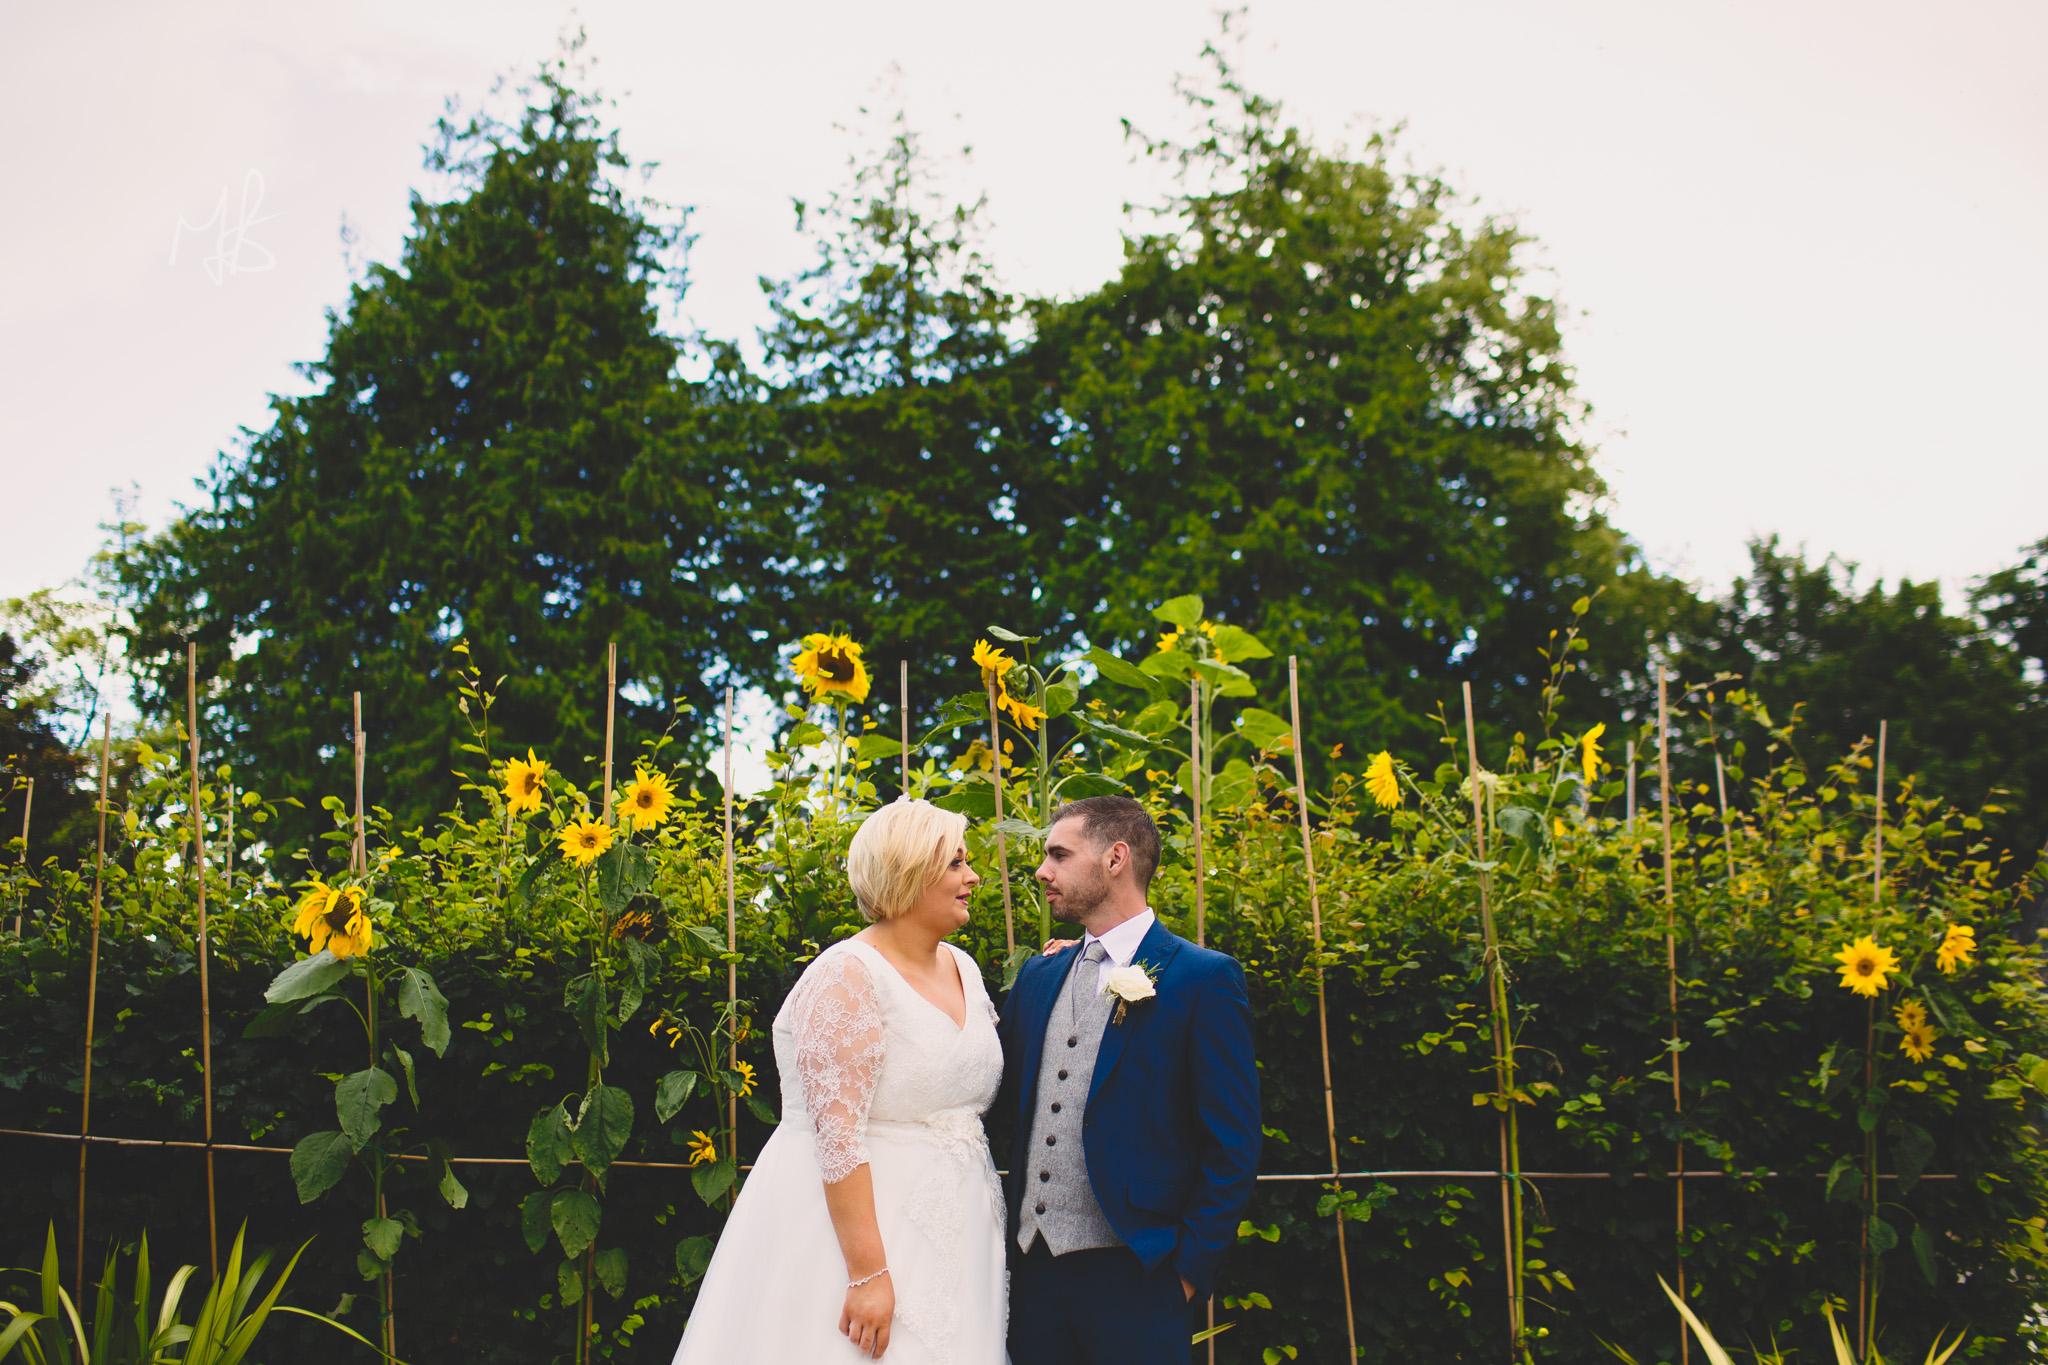 Northern-Ireland-Wedding-Photographer-Mark-Barnes-Ballymena_wedding-photography-Leighinmohr-House-Seamas_Alanna_For-web-35.jpg